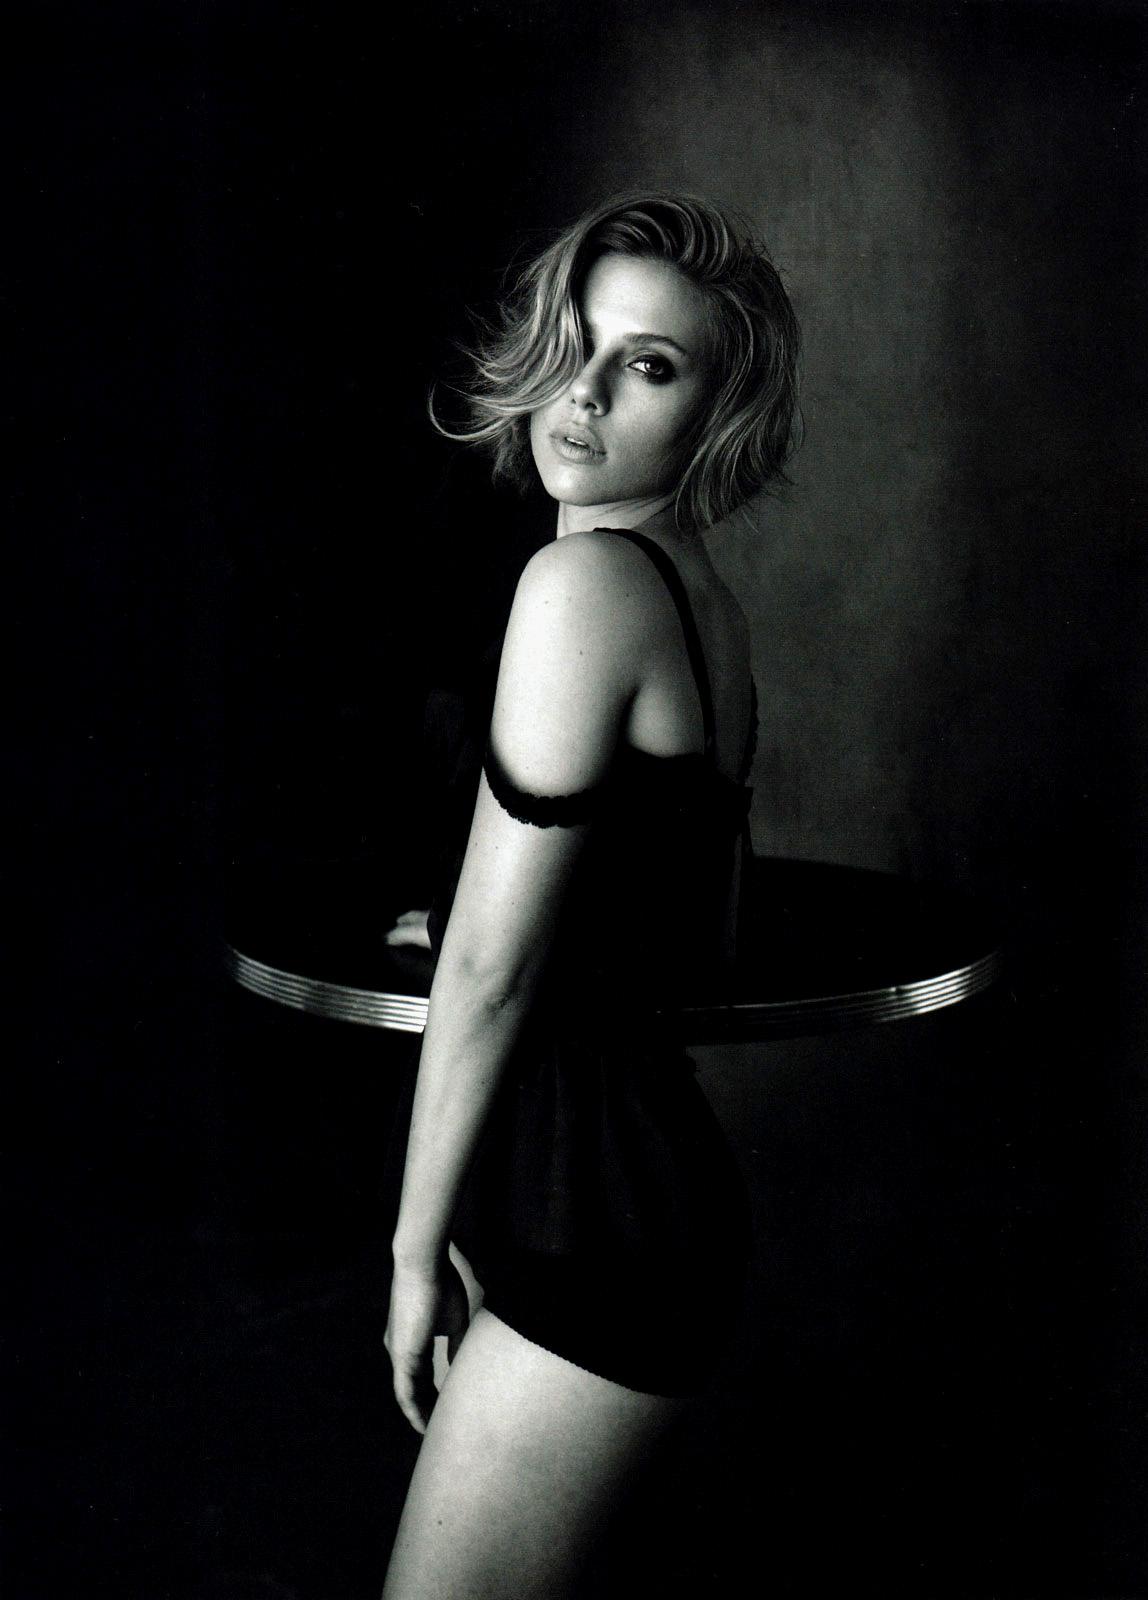 http://3.bp.blogspot.com/-z9uqBbO8htA/To5H23Rn6sI/AAAAAAAAQzQ/EhmvR1-itdo/s1600/Scarlett-Johansson3.jpg